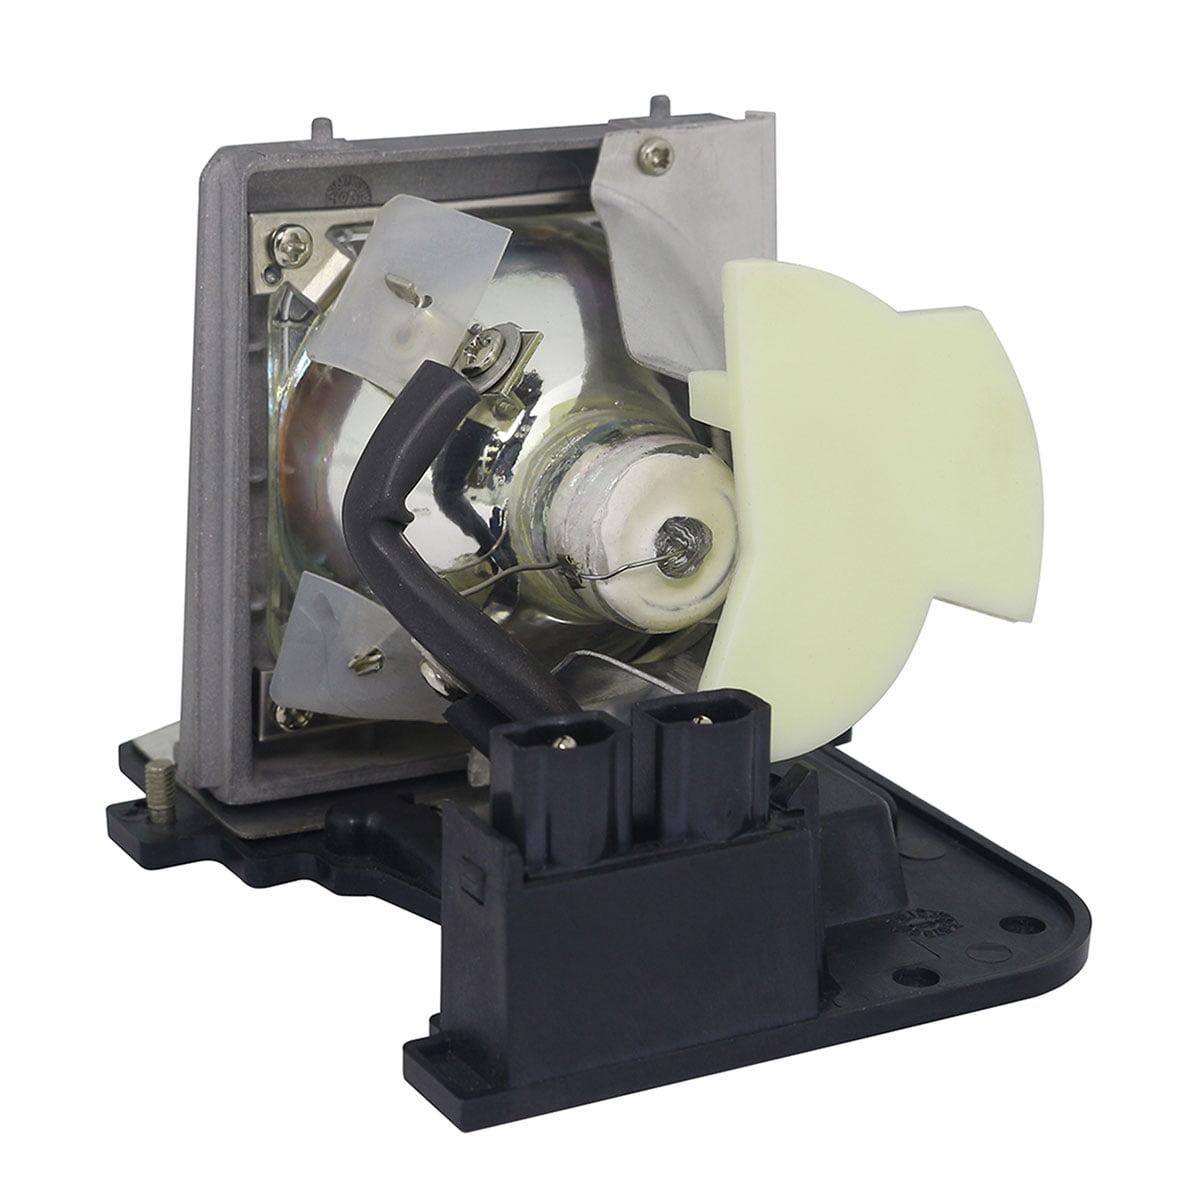 OPTOMA BL-FU200C BLFU200C LAMP FOR MODELS EP706 EP706S EP707 EP708 EP709 EP709S